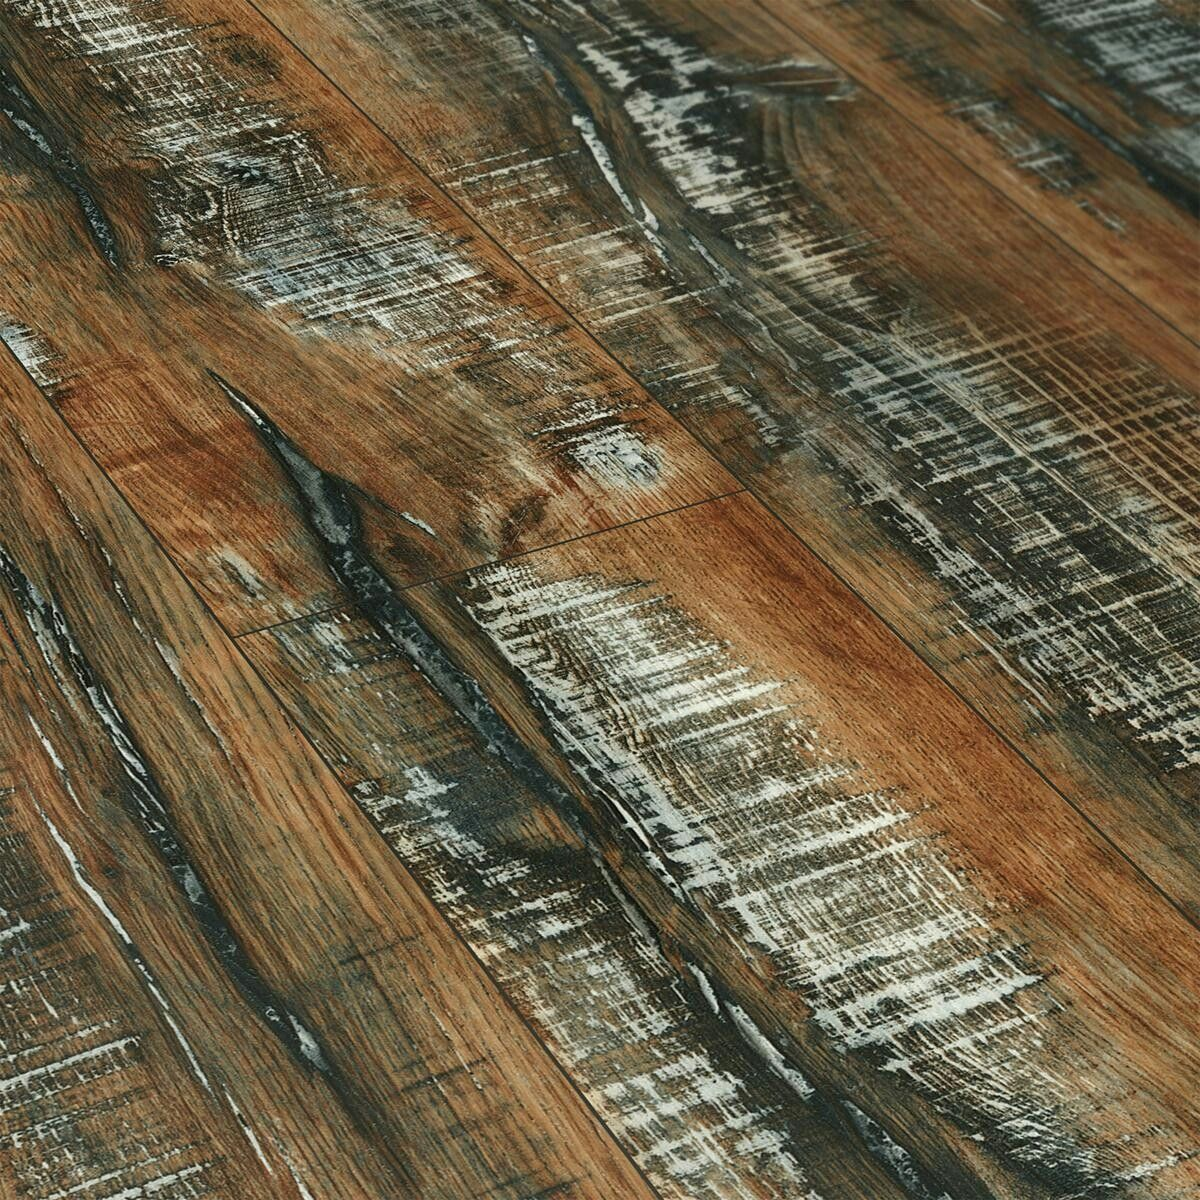 Pin by Crystal Johnson on flooring Barn wood, Laminate